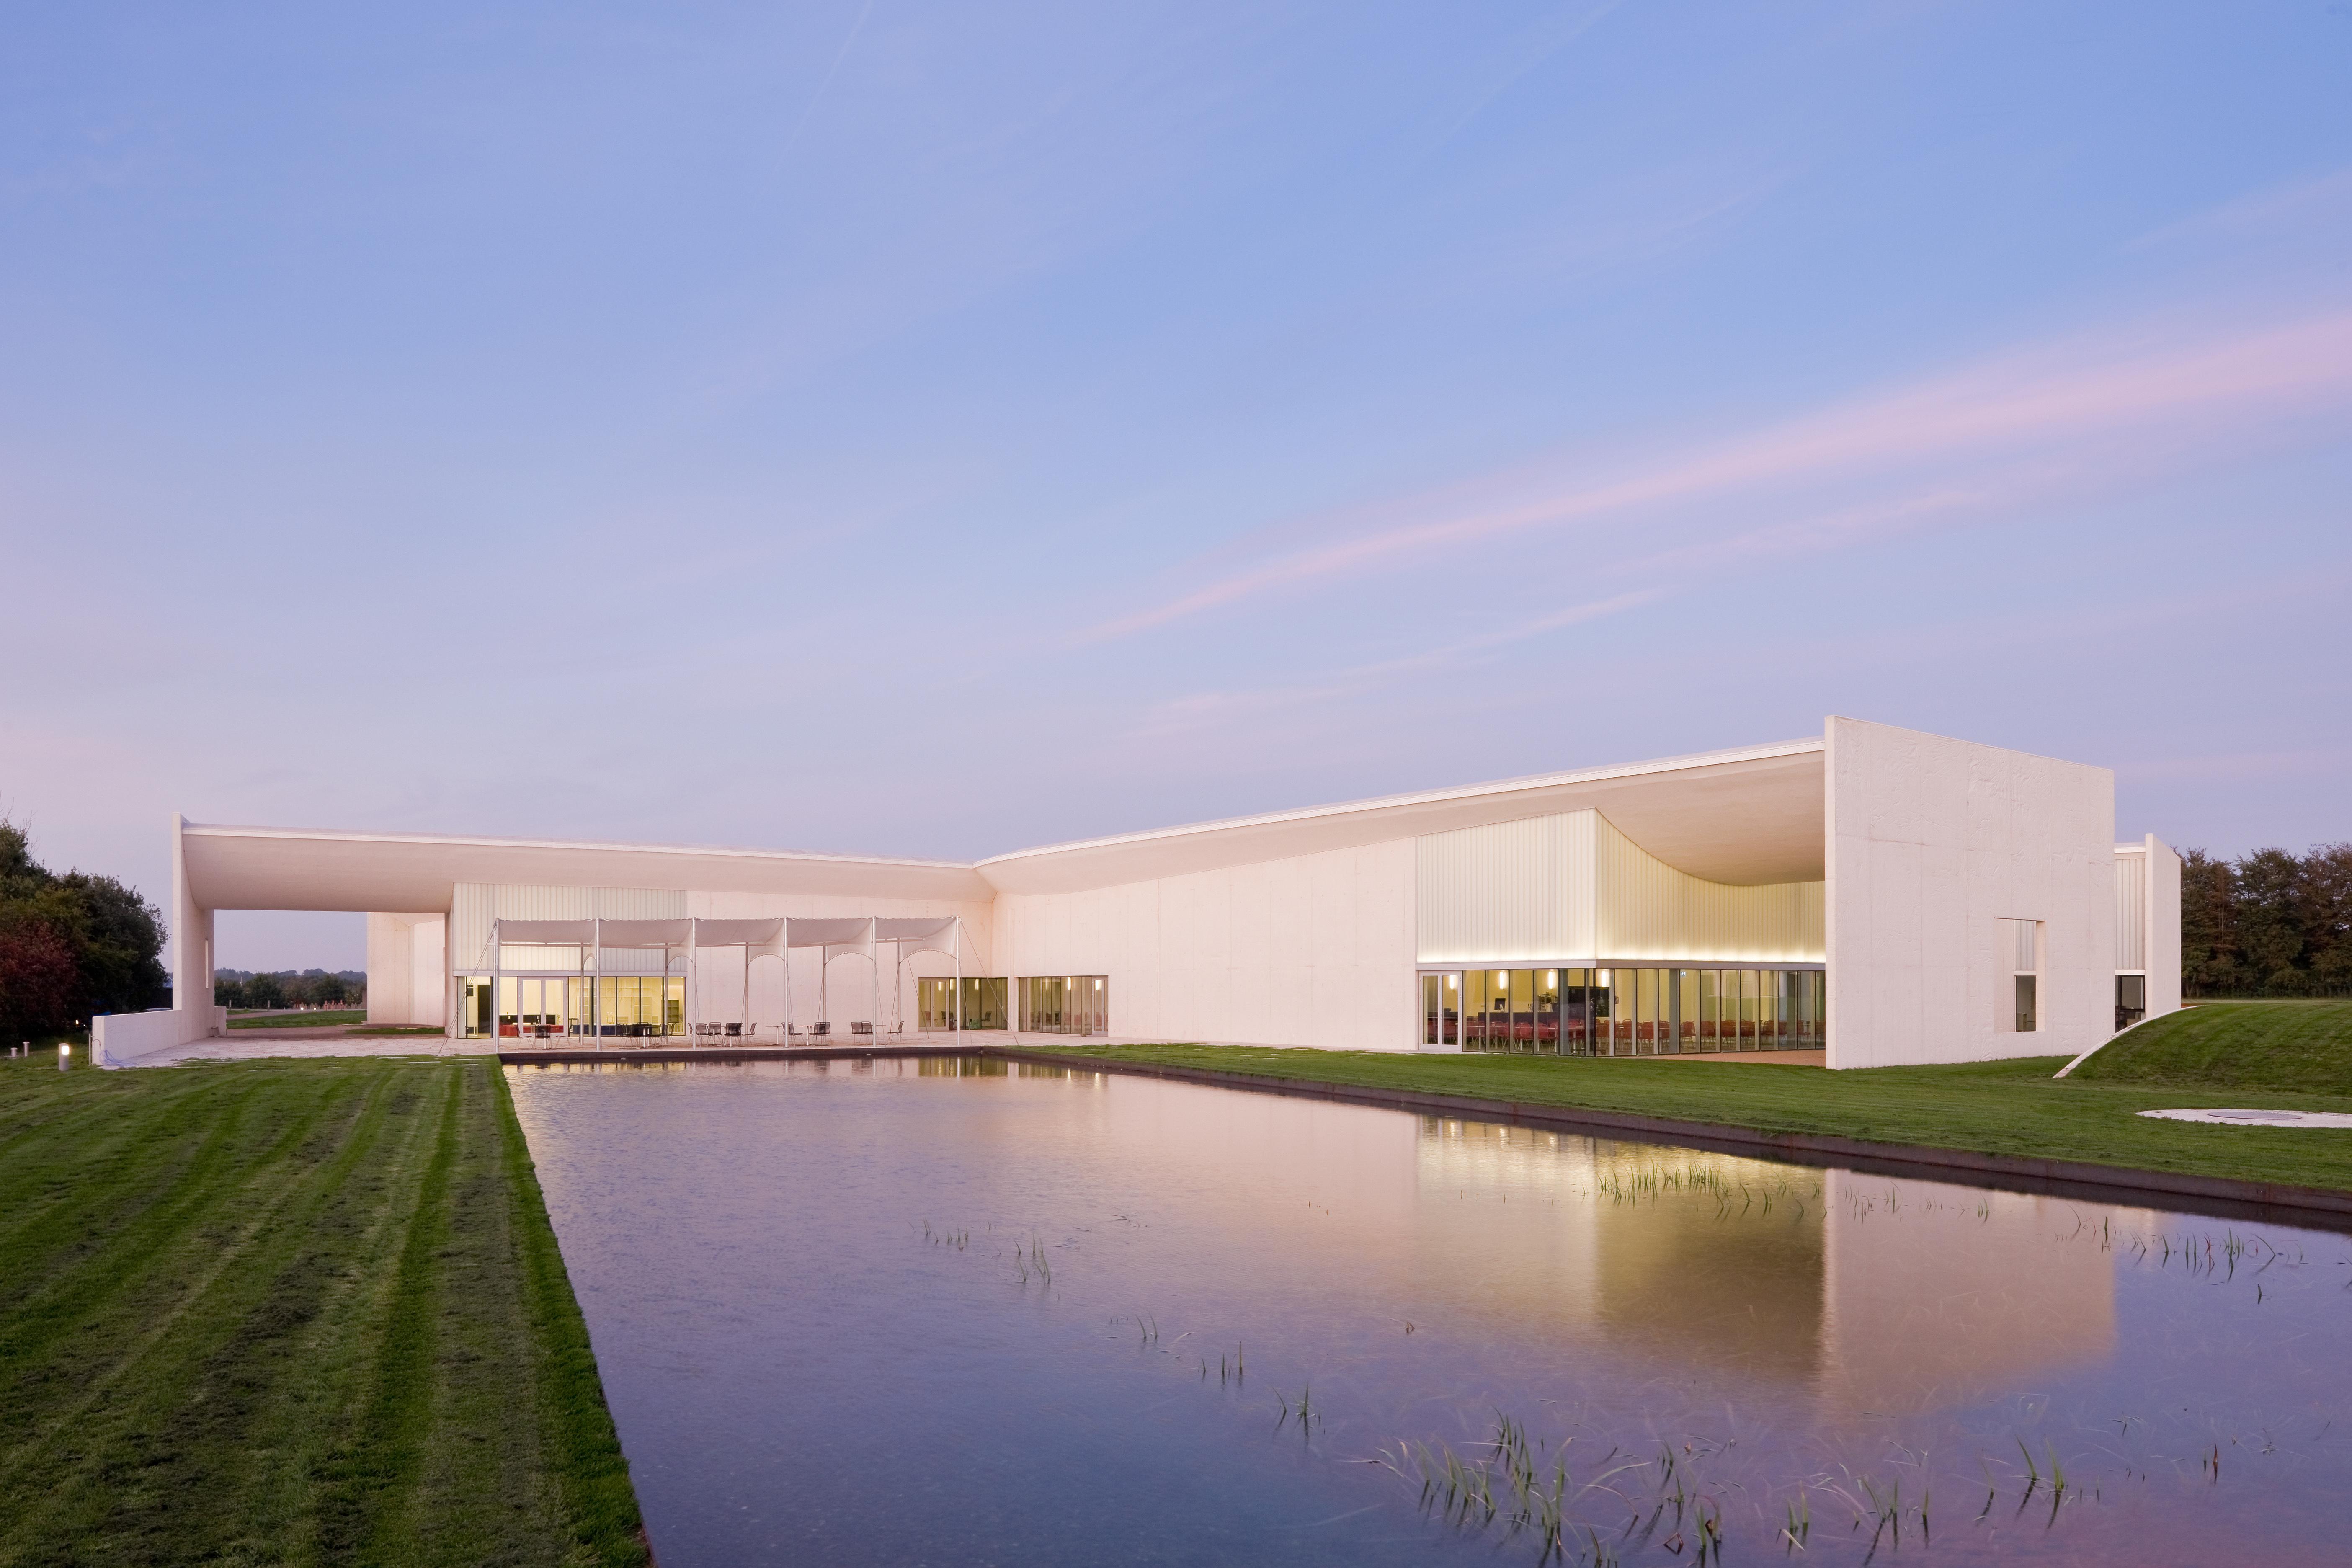 HEART - Museum of Contemporary Art